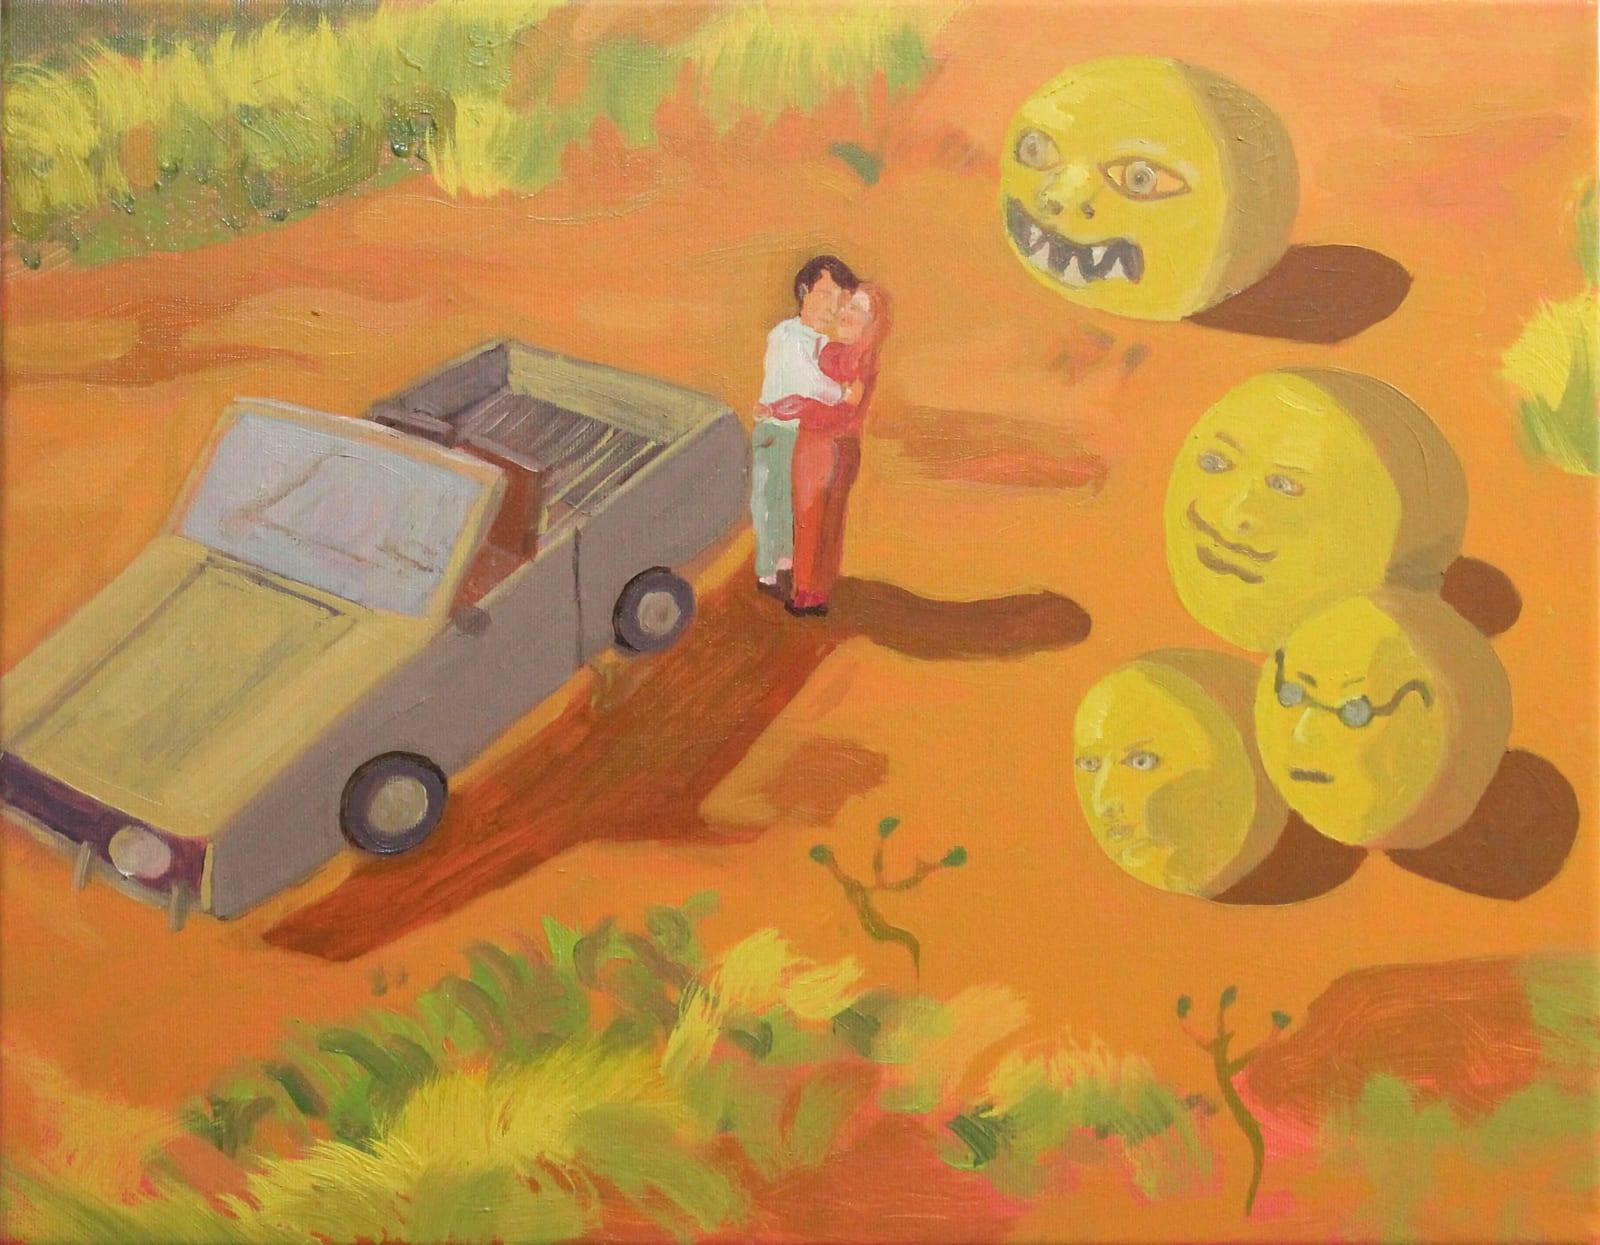 Oscar Fouz Lopez Untitled Oil on canvas 40 x 50 cm